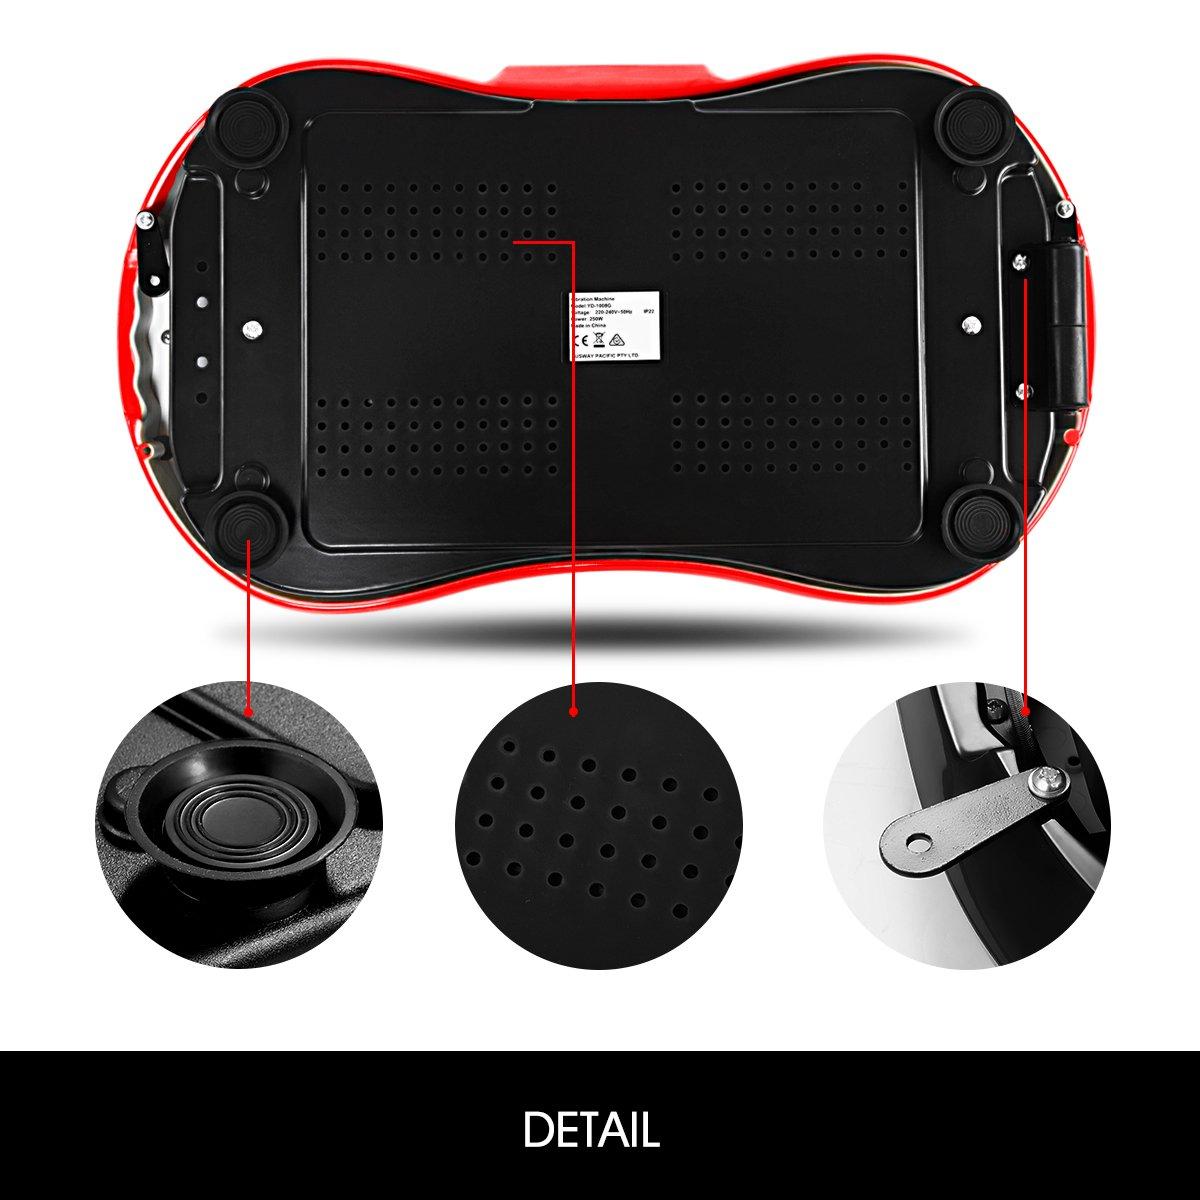 GENKI Fitness Vibration Platform Workout Machine Whole Full Body Shape Exercise Training Power Plate (Red) by GENKI (Image #7)